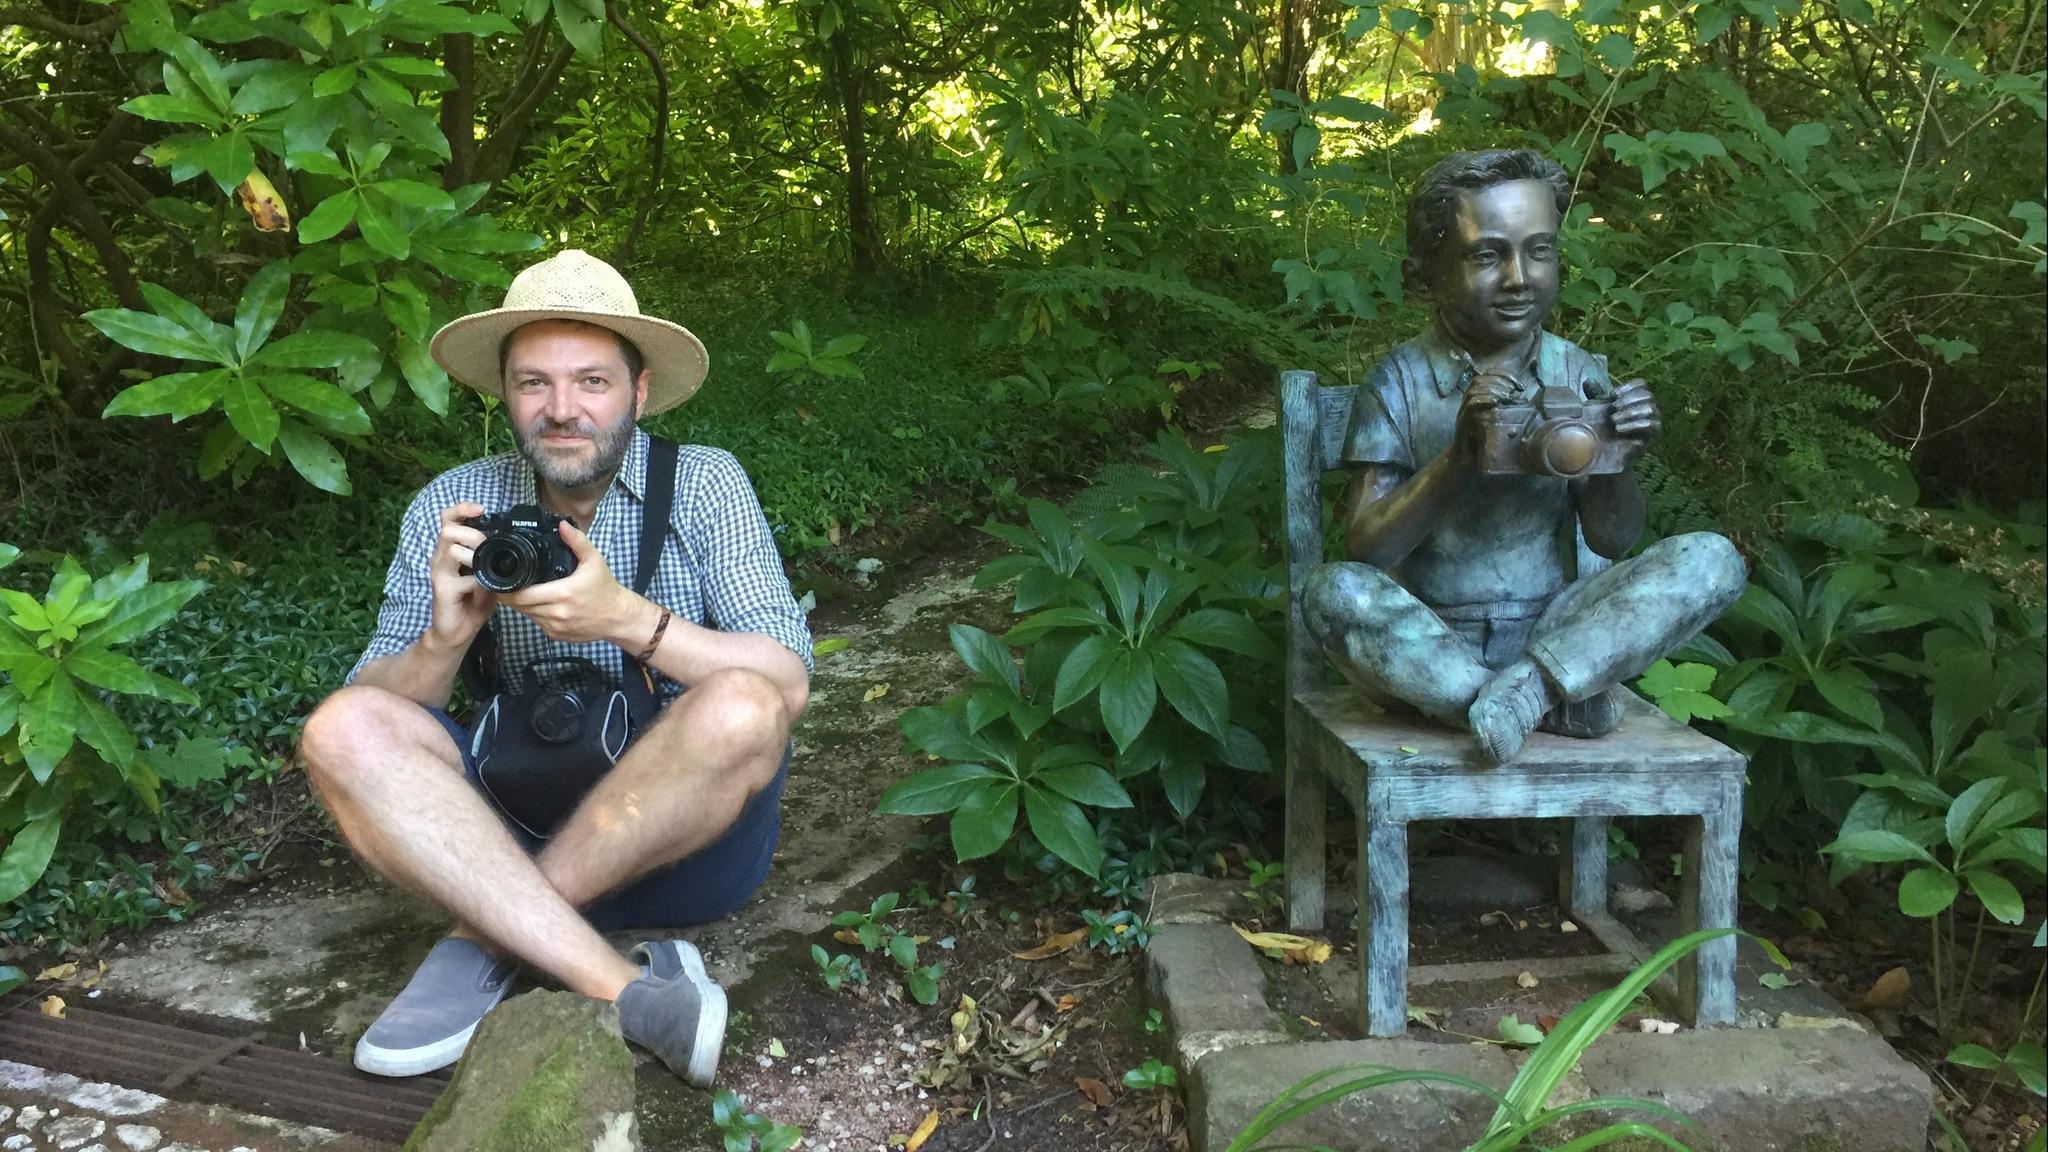 Life imitating art as Aaron poses alongside sculpture